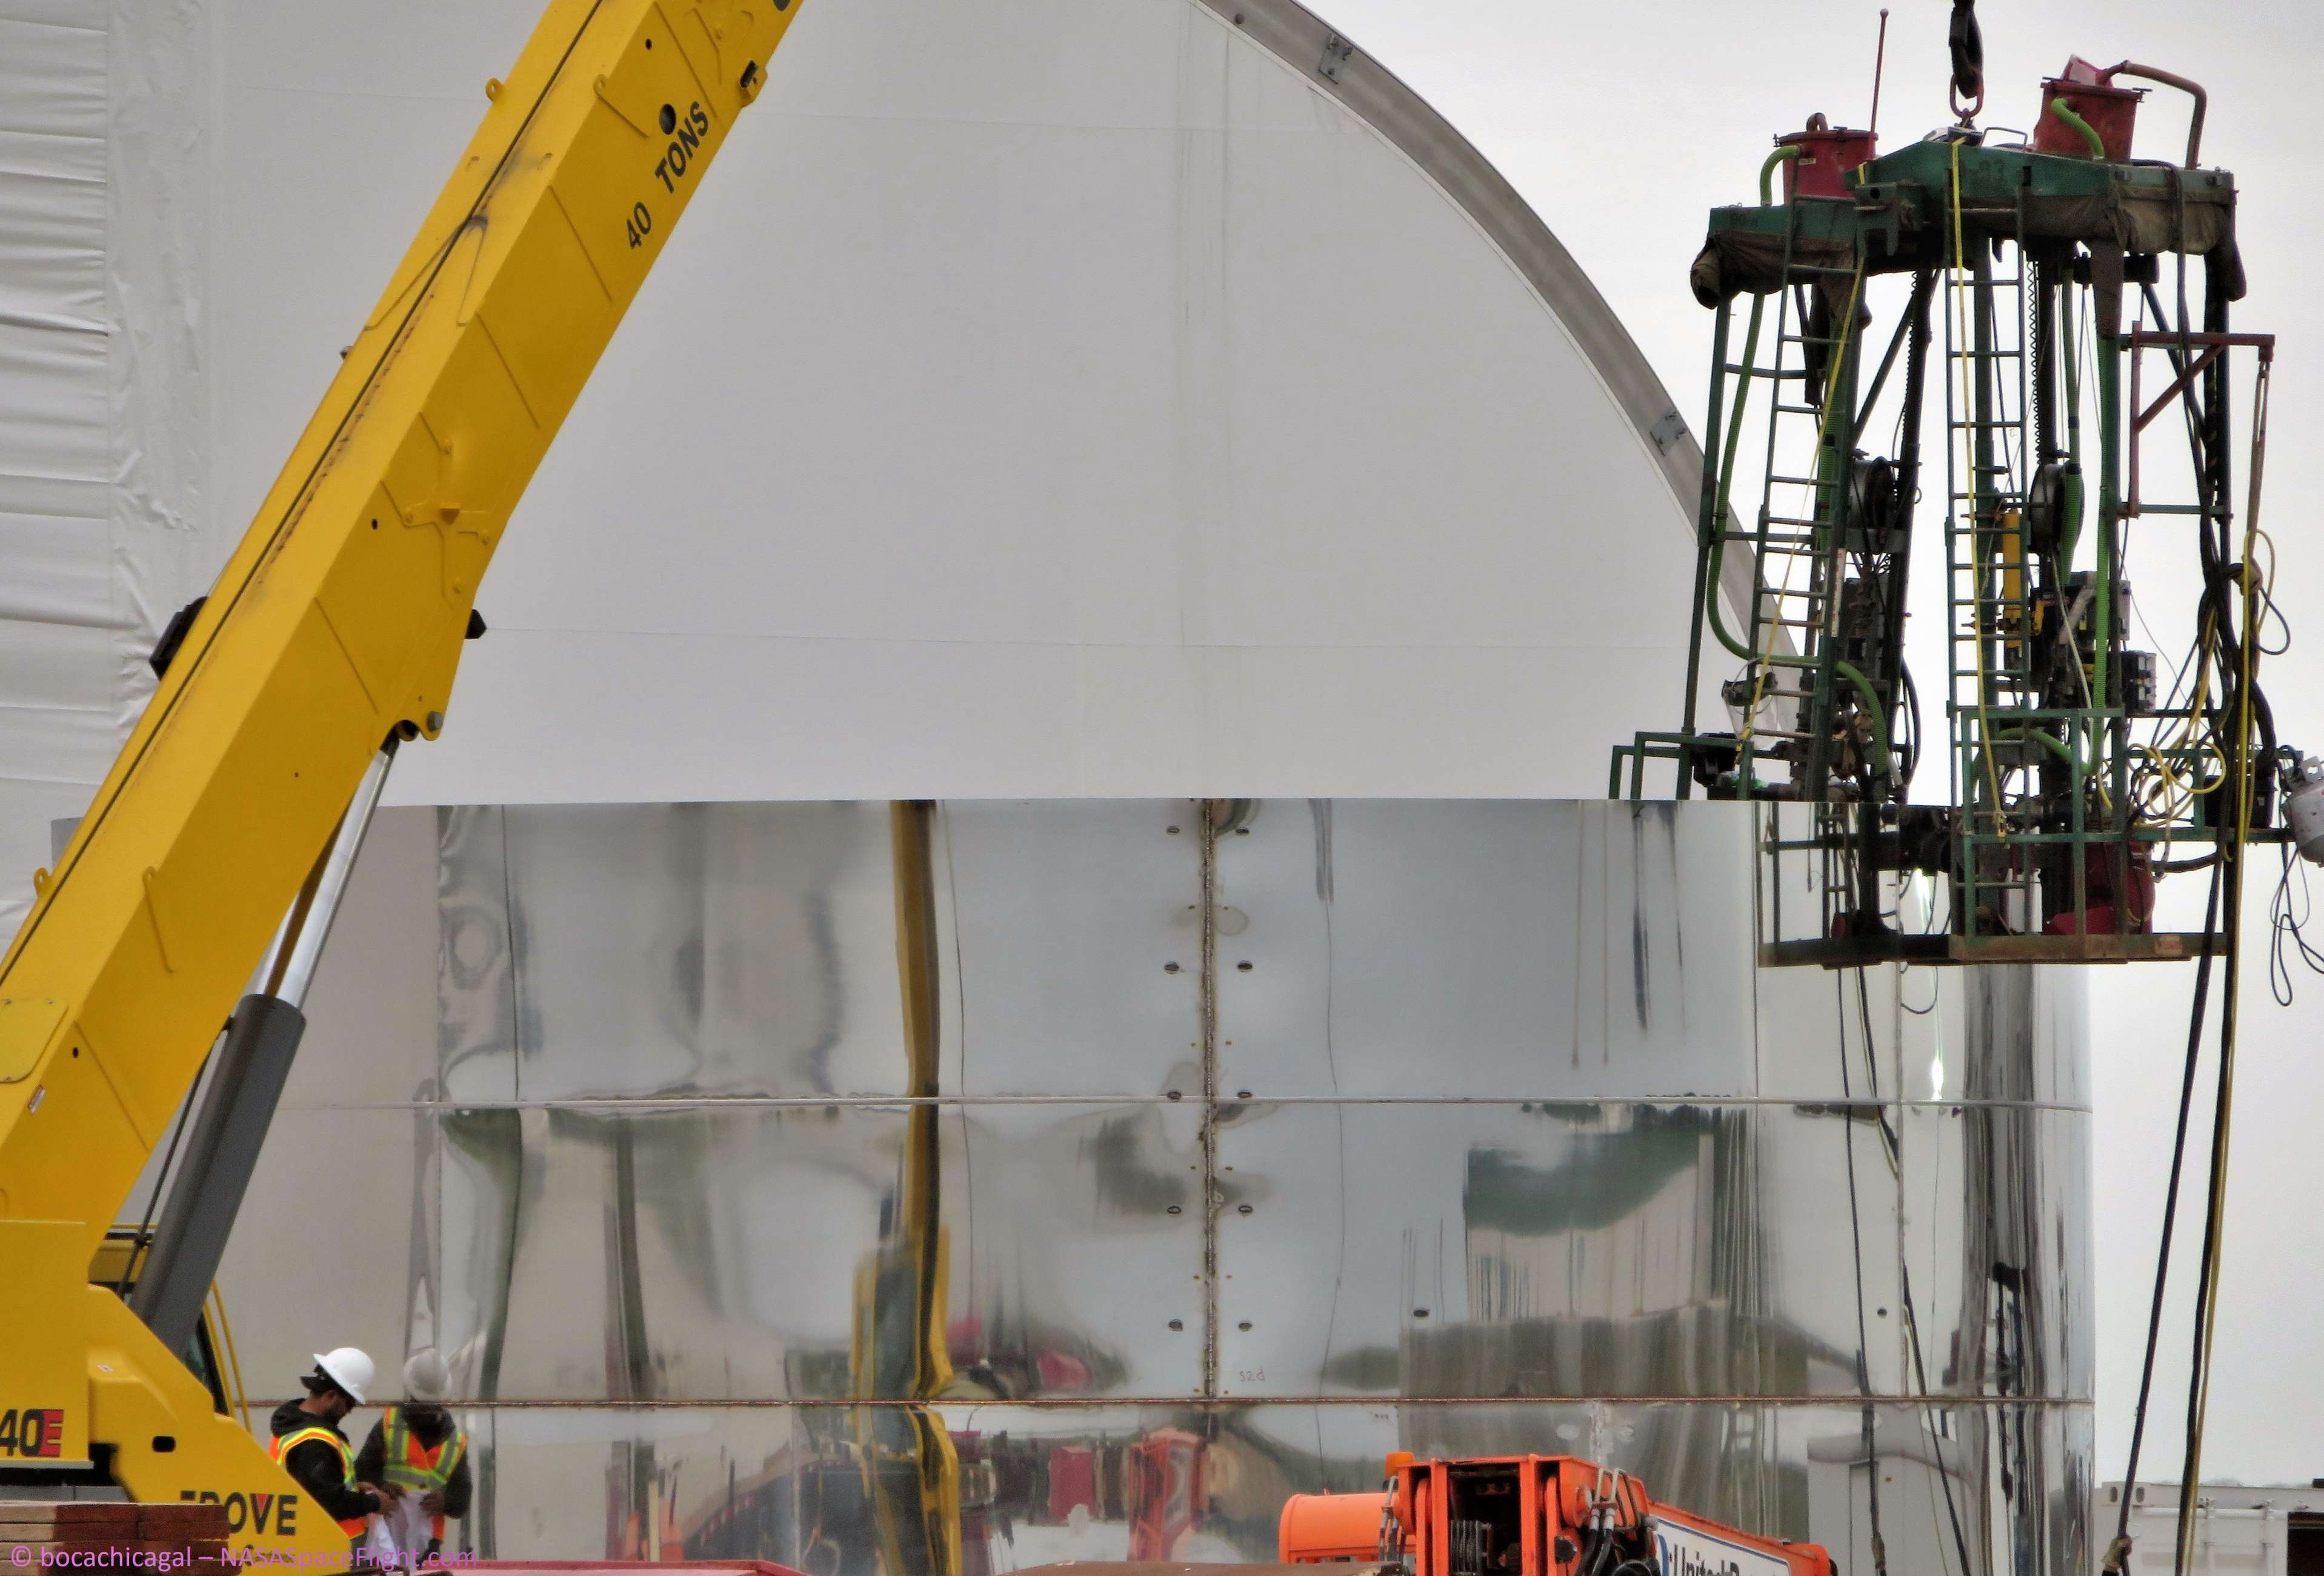 Boca Chica Starship progress 022419 (NASASpaceflight – bocachicagal) 4 (c)